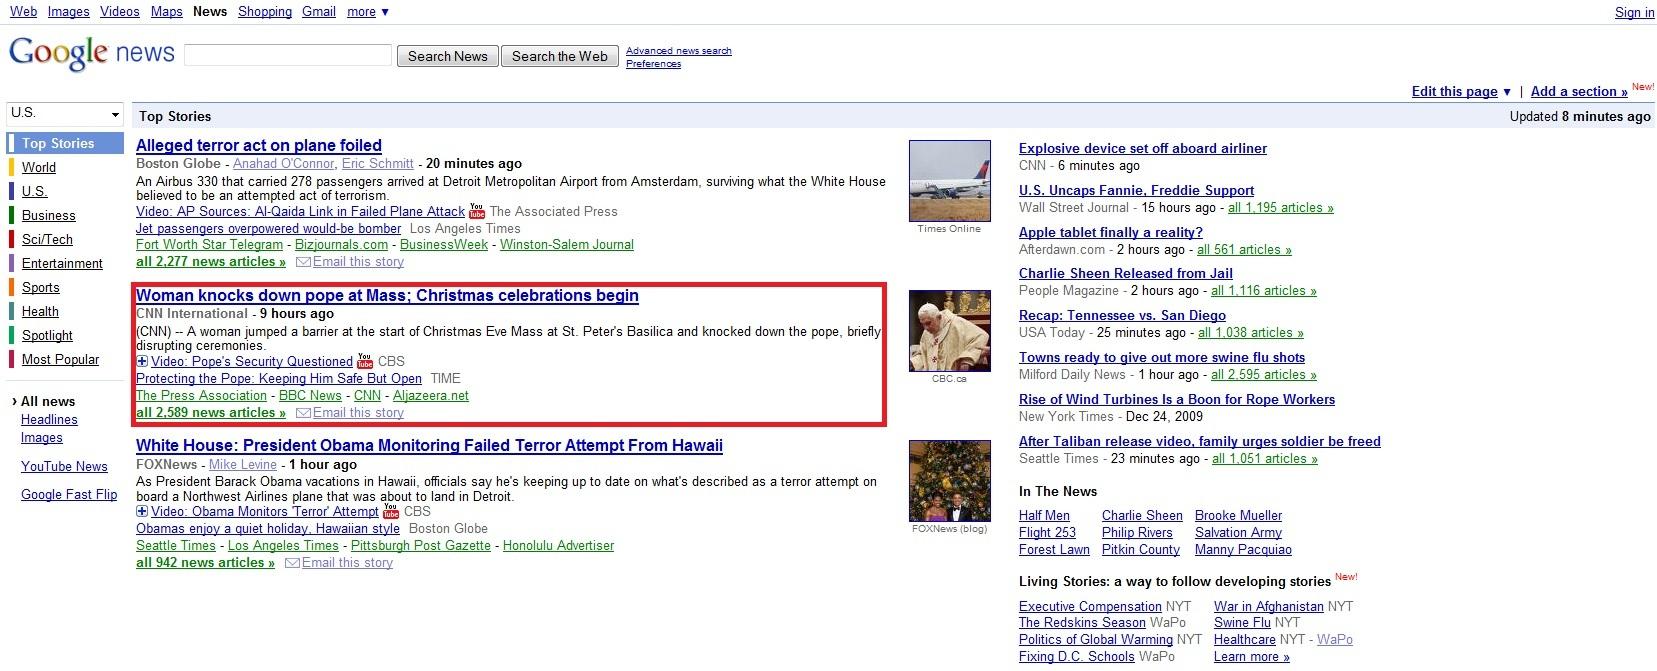 Google News Slip Up